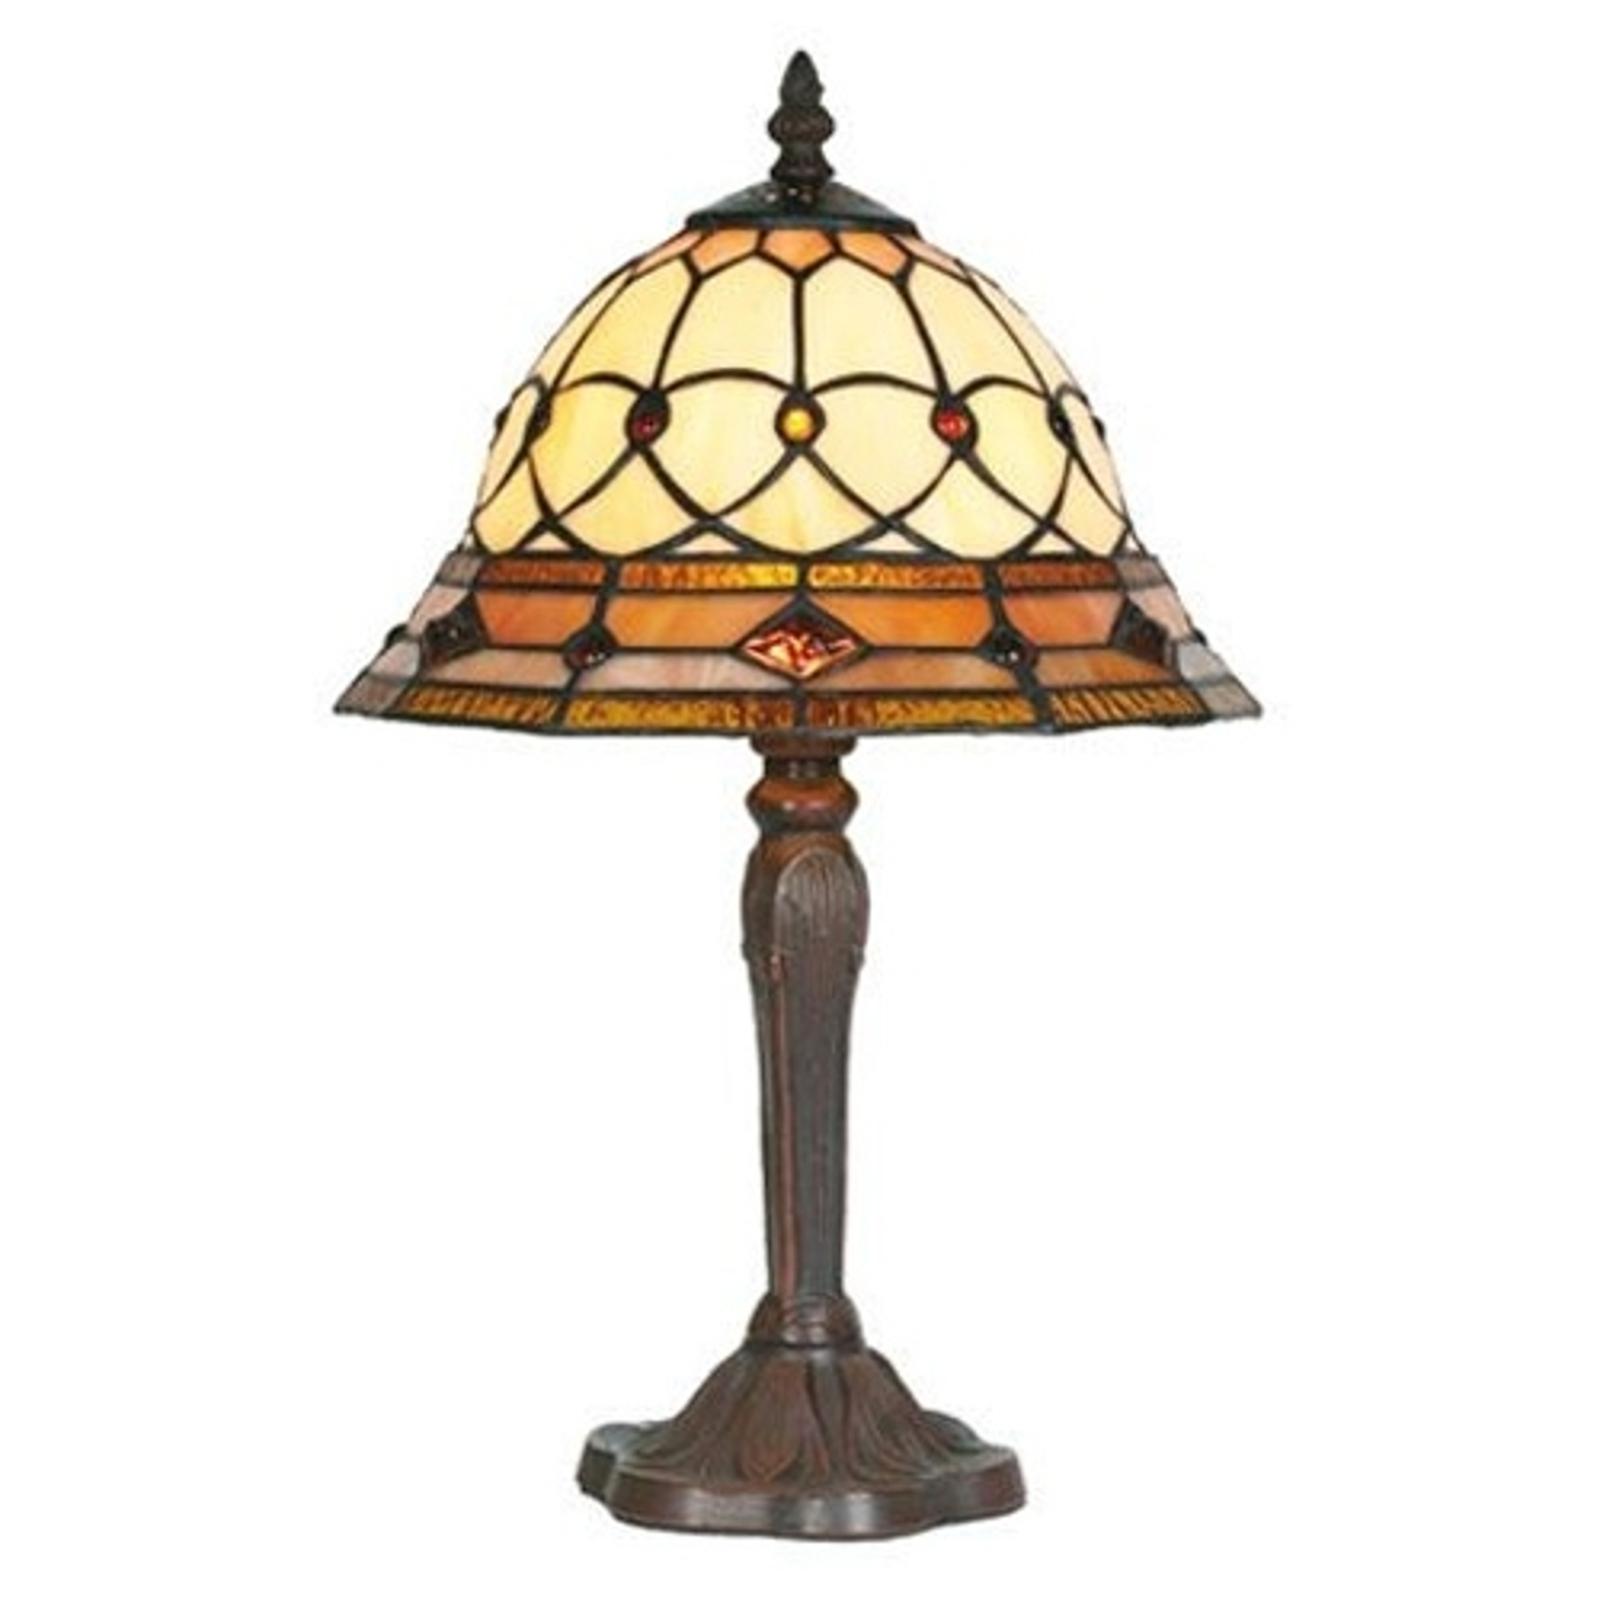 ANTHEA tafellamp in Tiffany-stijl